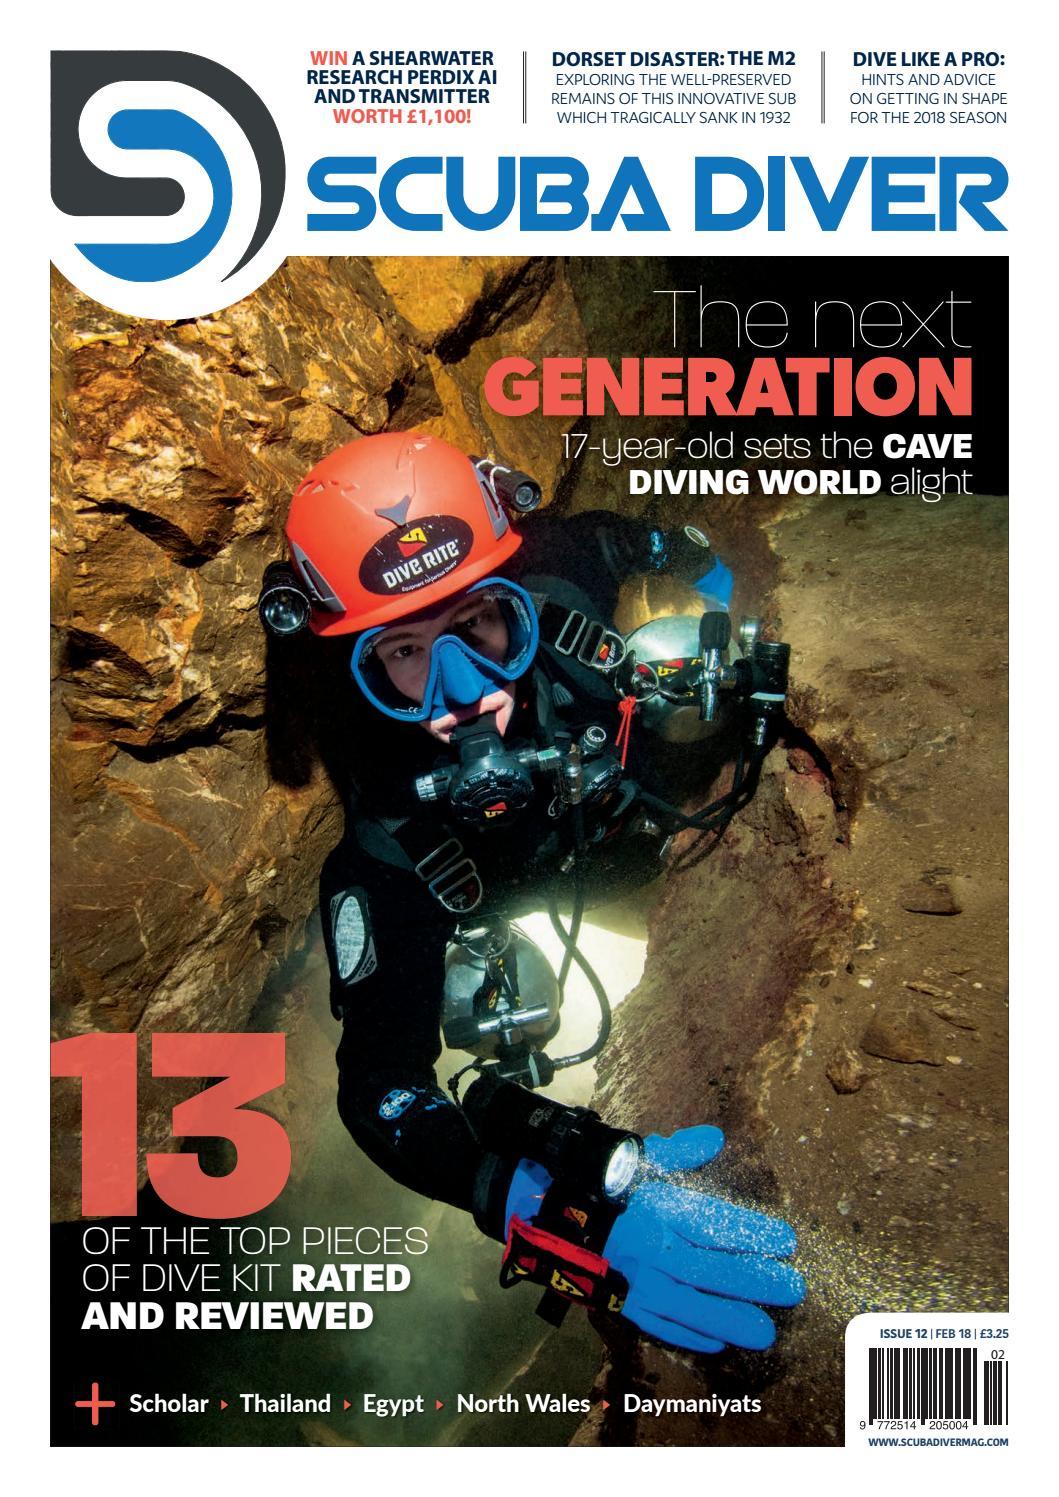 ed2b545432f2 Scuba Diver Febraury 18 - Issue 12 by scubadivermag - issuu